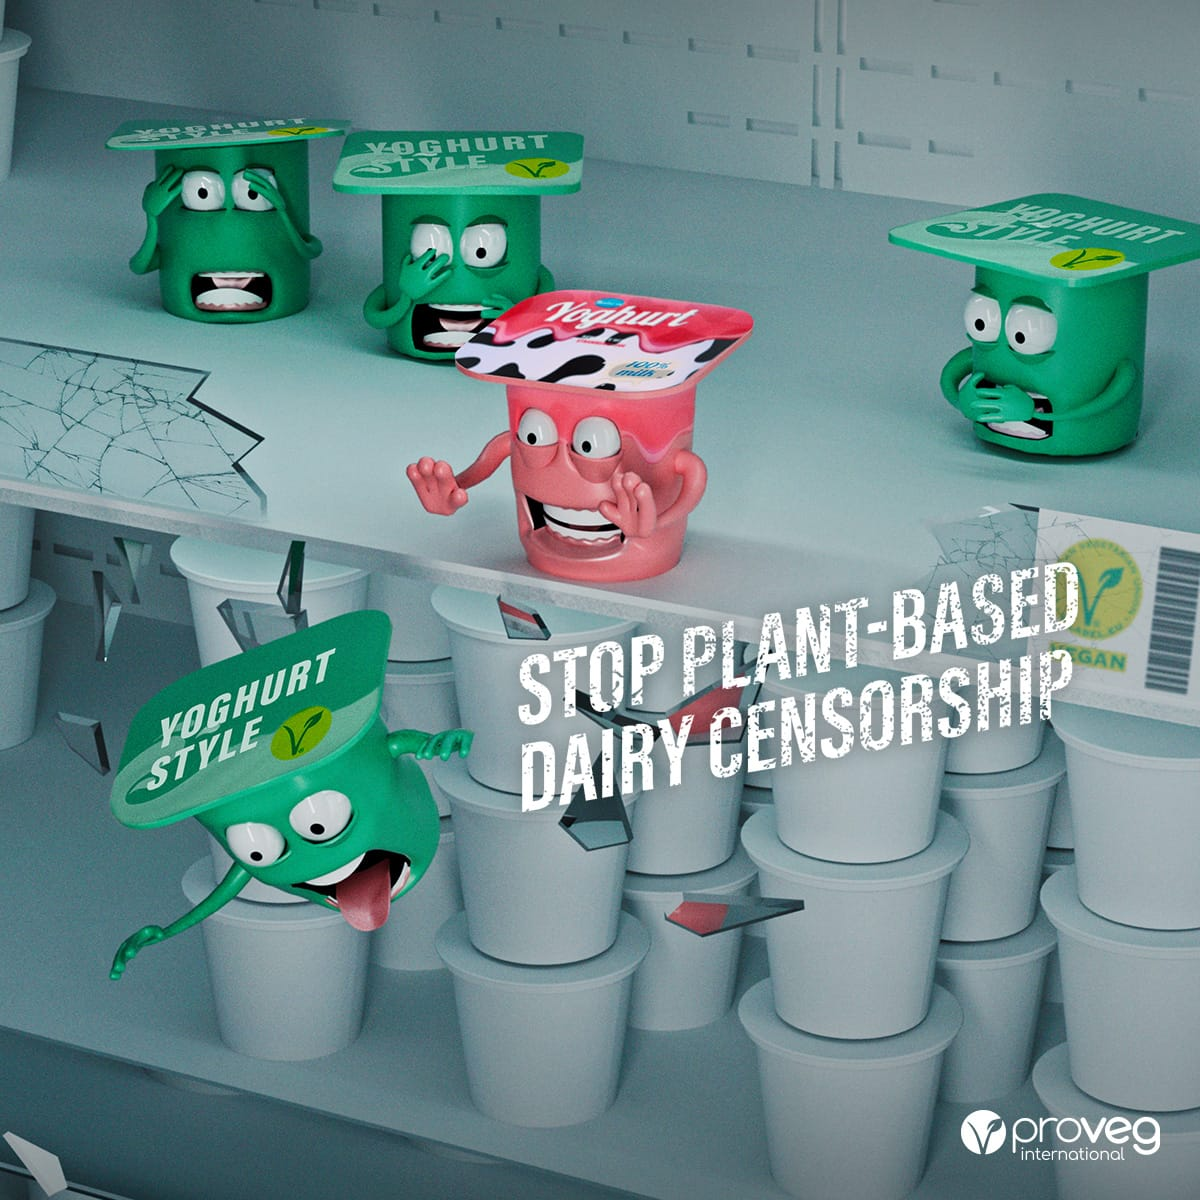 EU Amendment 171 - Plant-based dairy censorship